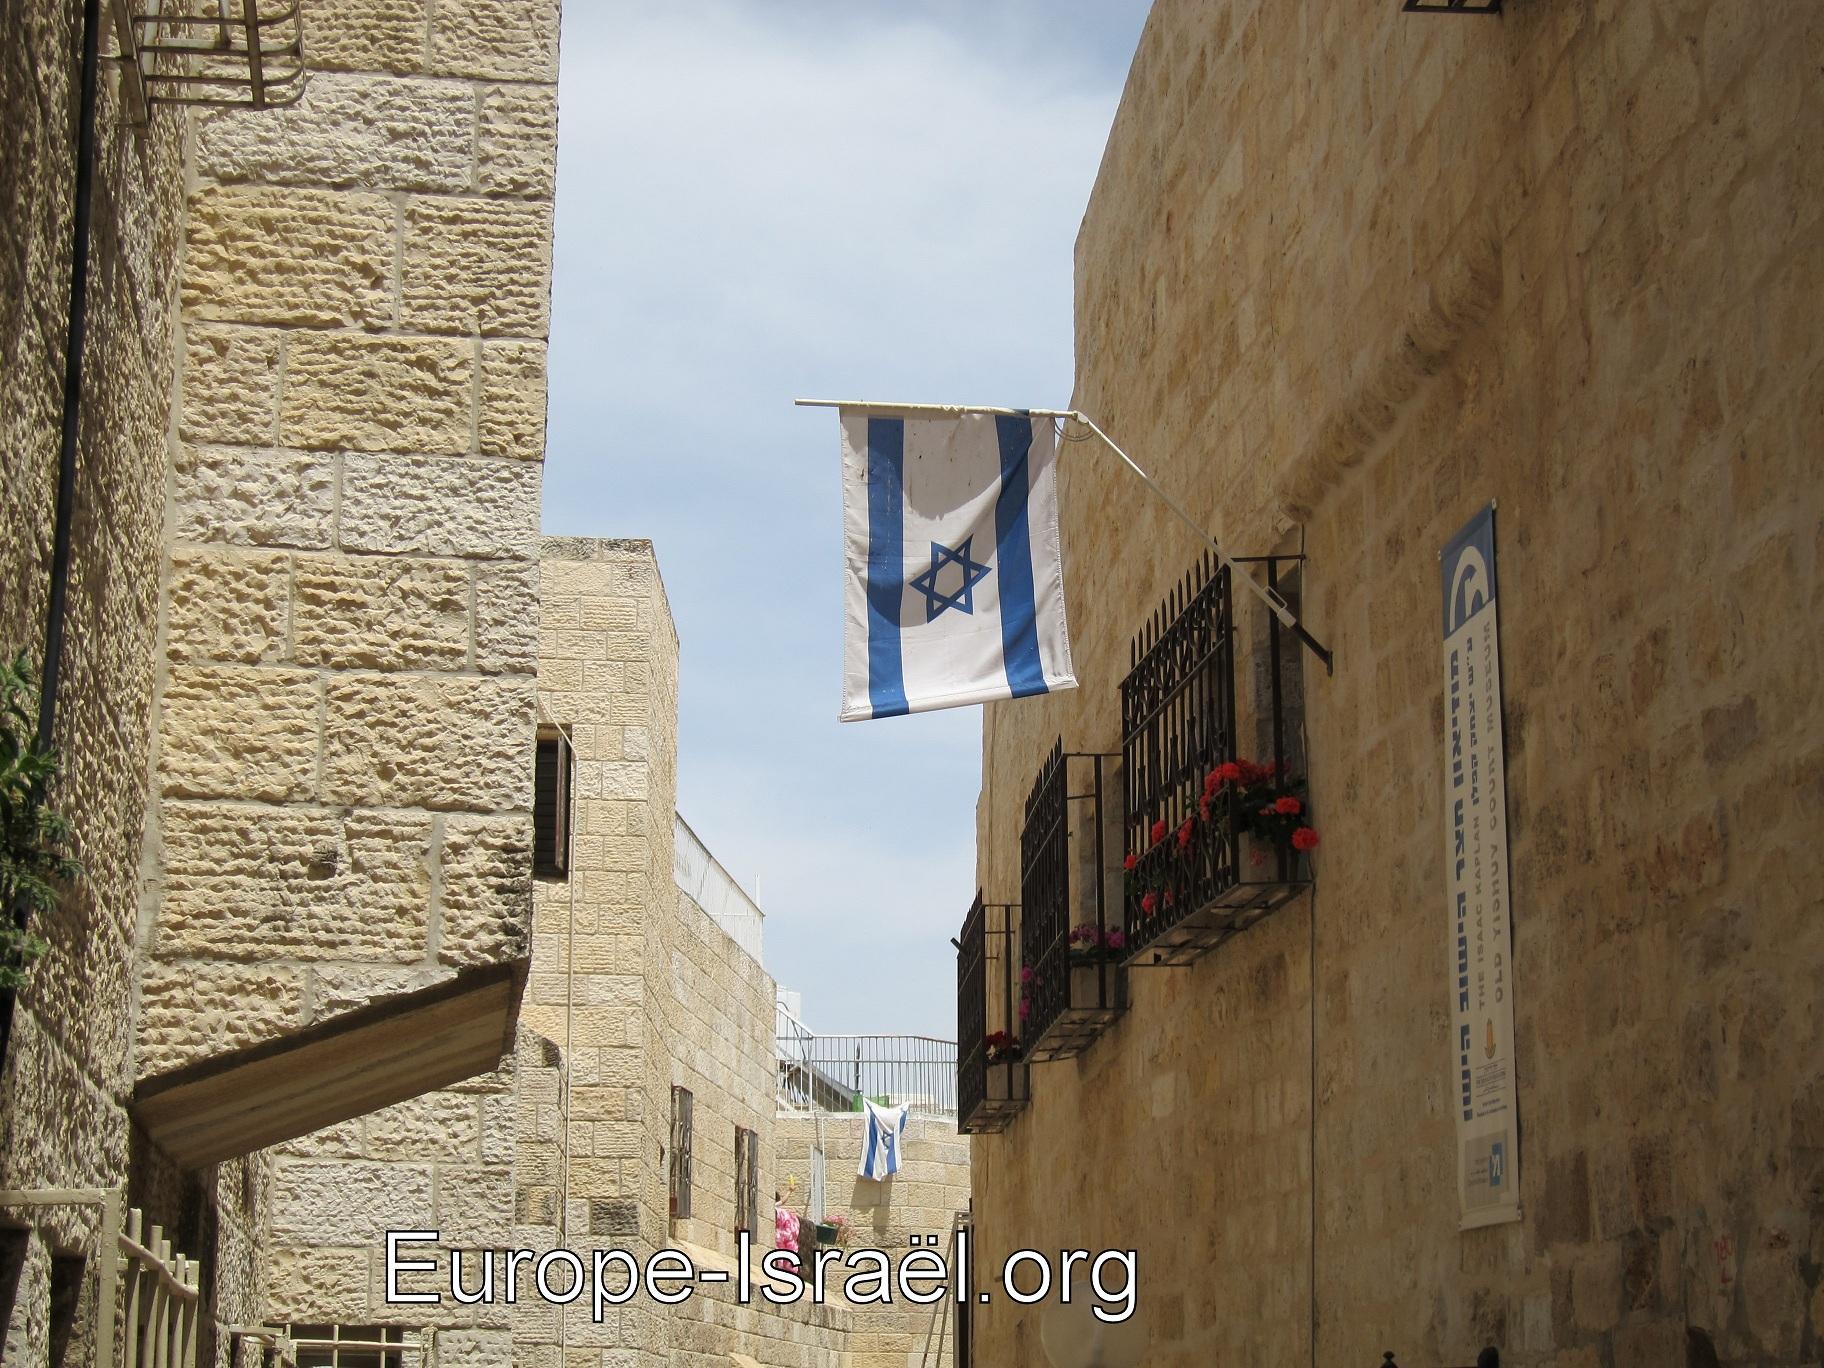 Israël, État juif, État du peuple juif ou État du peuple israélien ? par Richard Abitbol